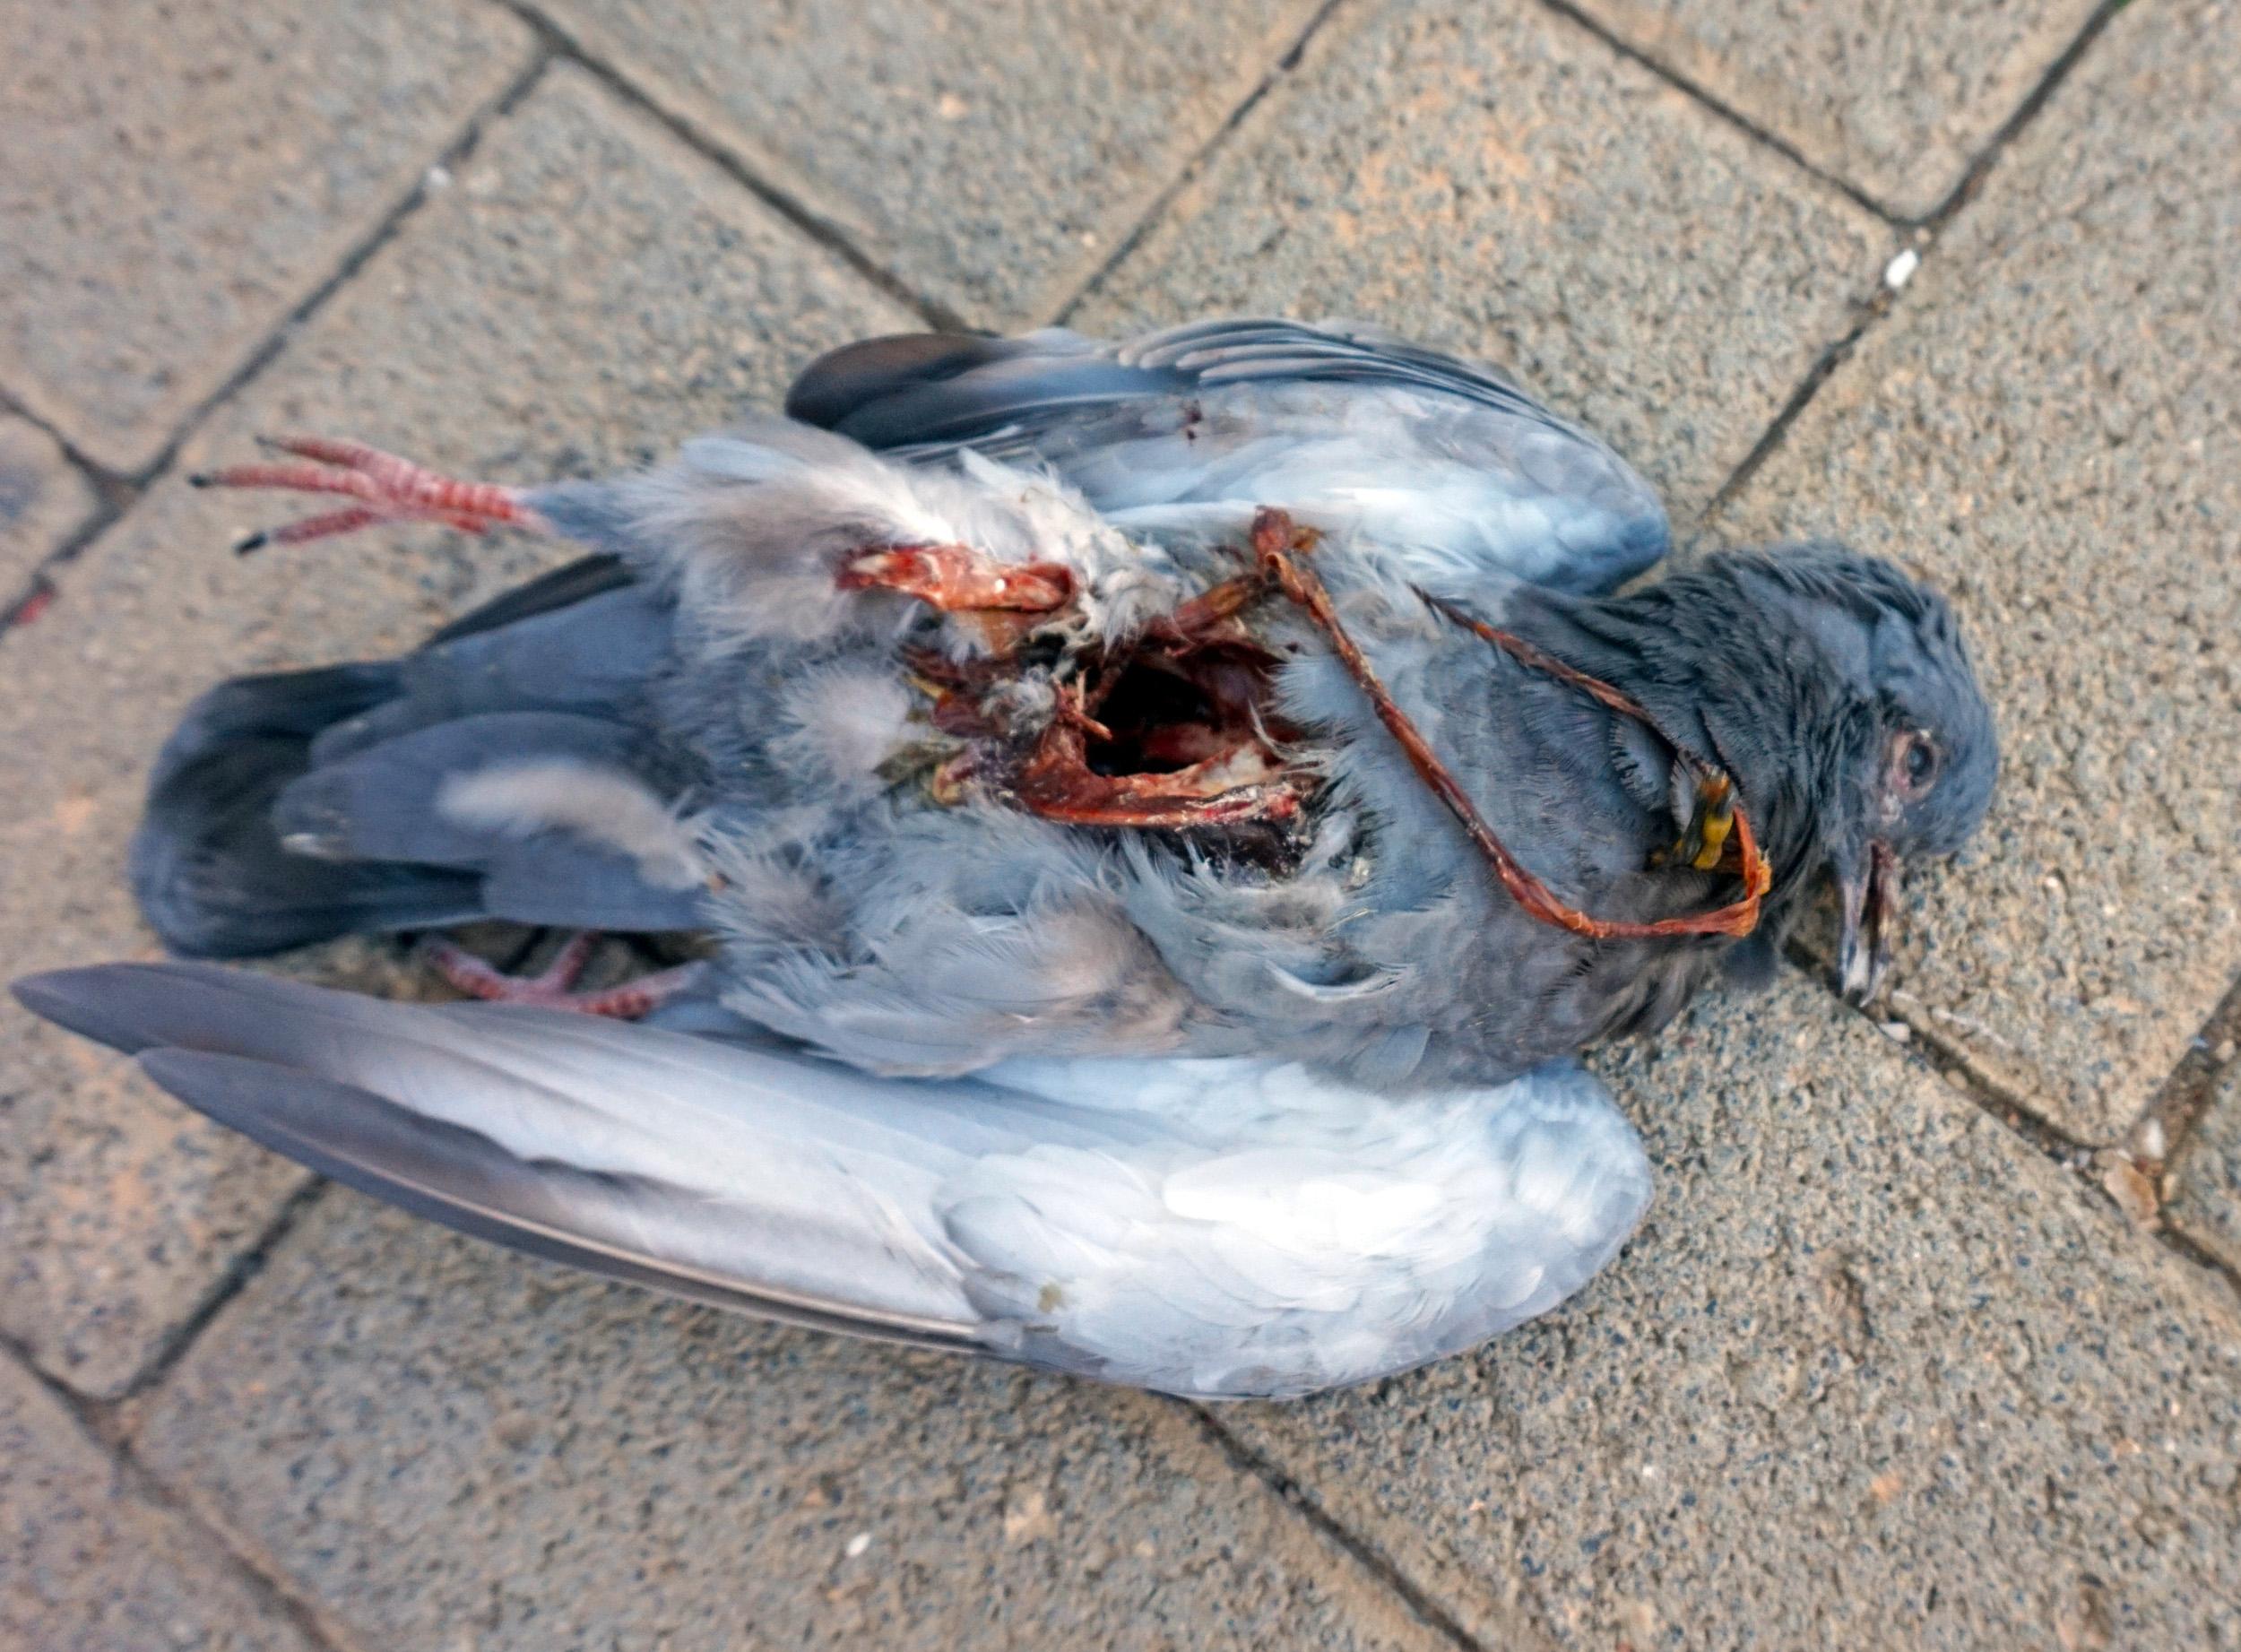 birdcels are not even human *Warning: BRUTAL*